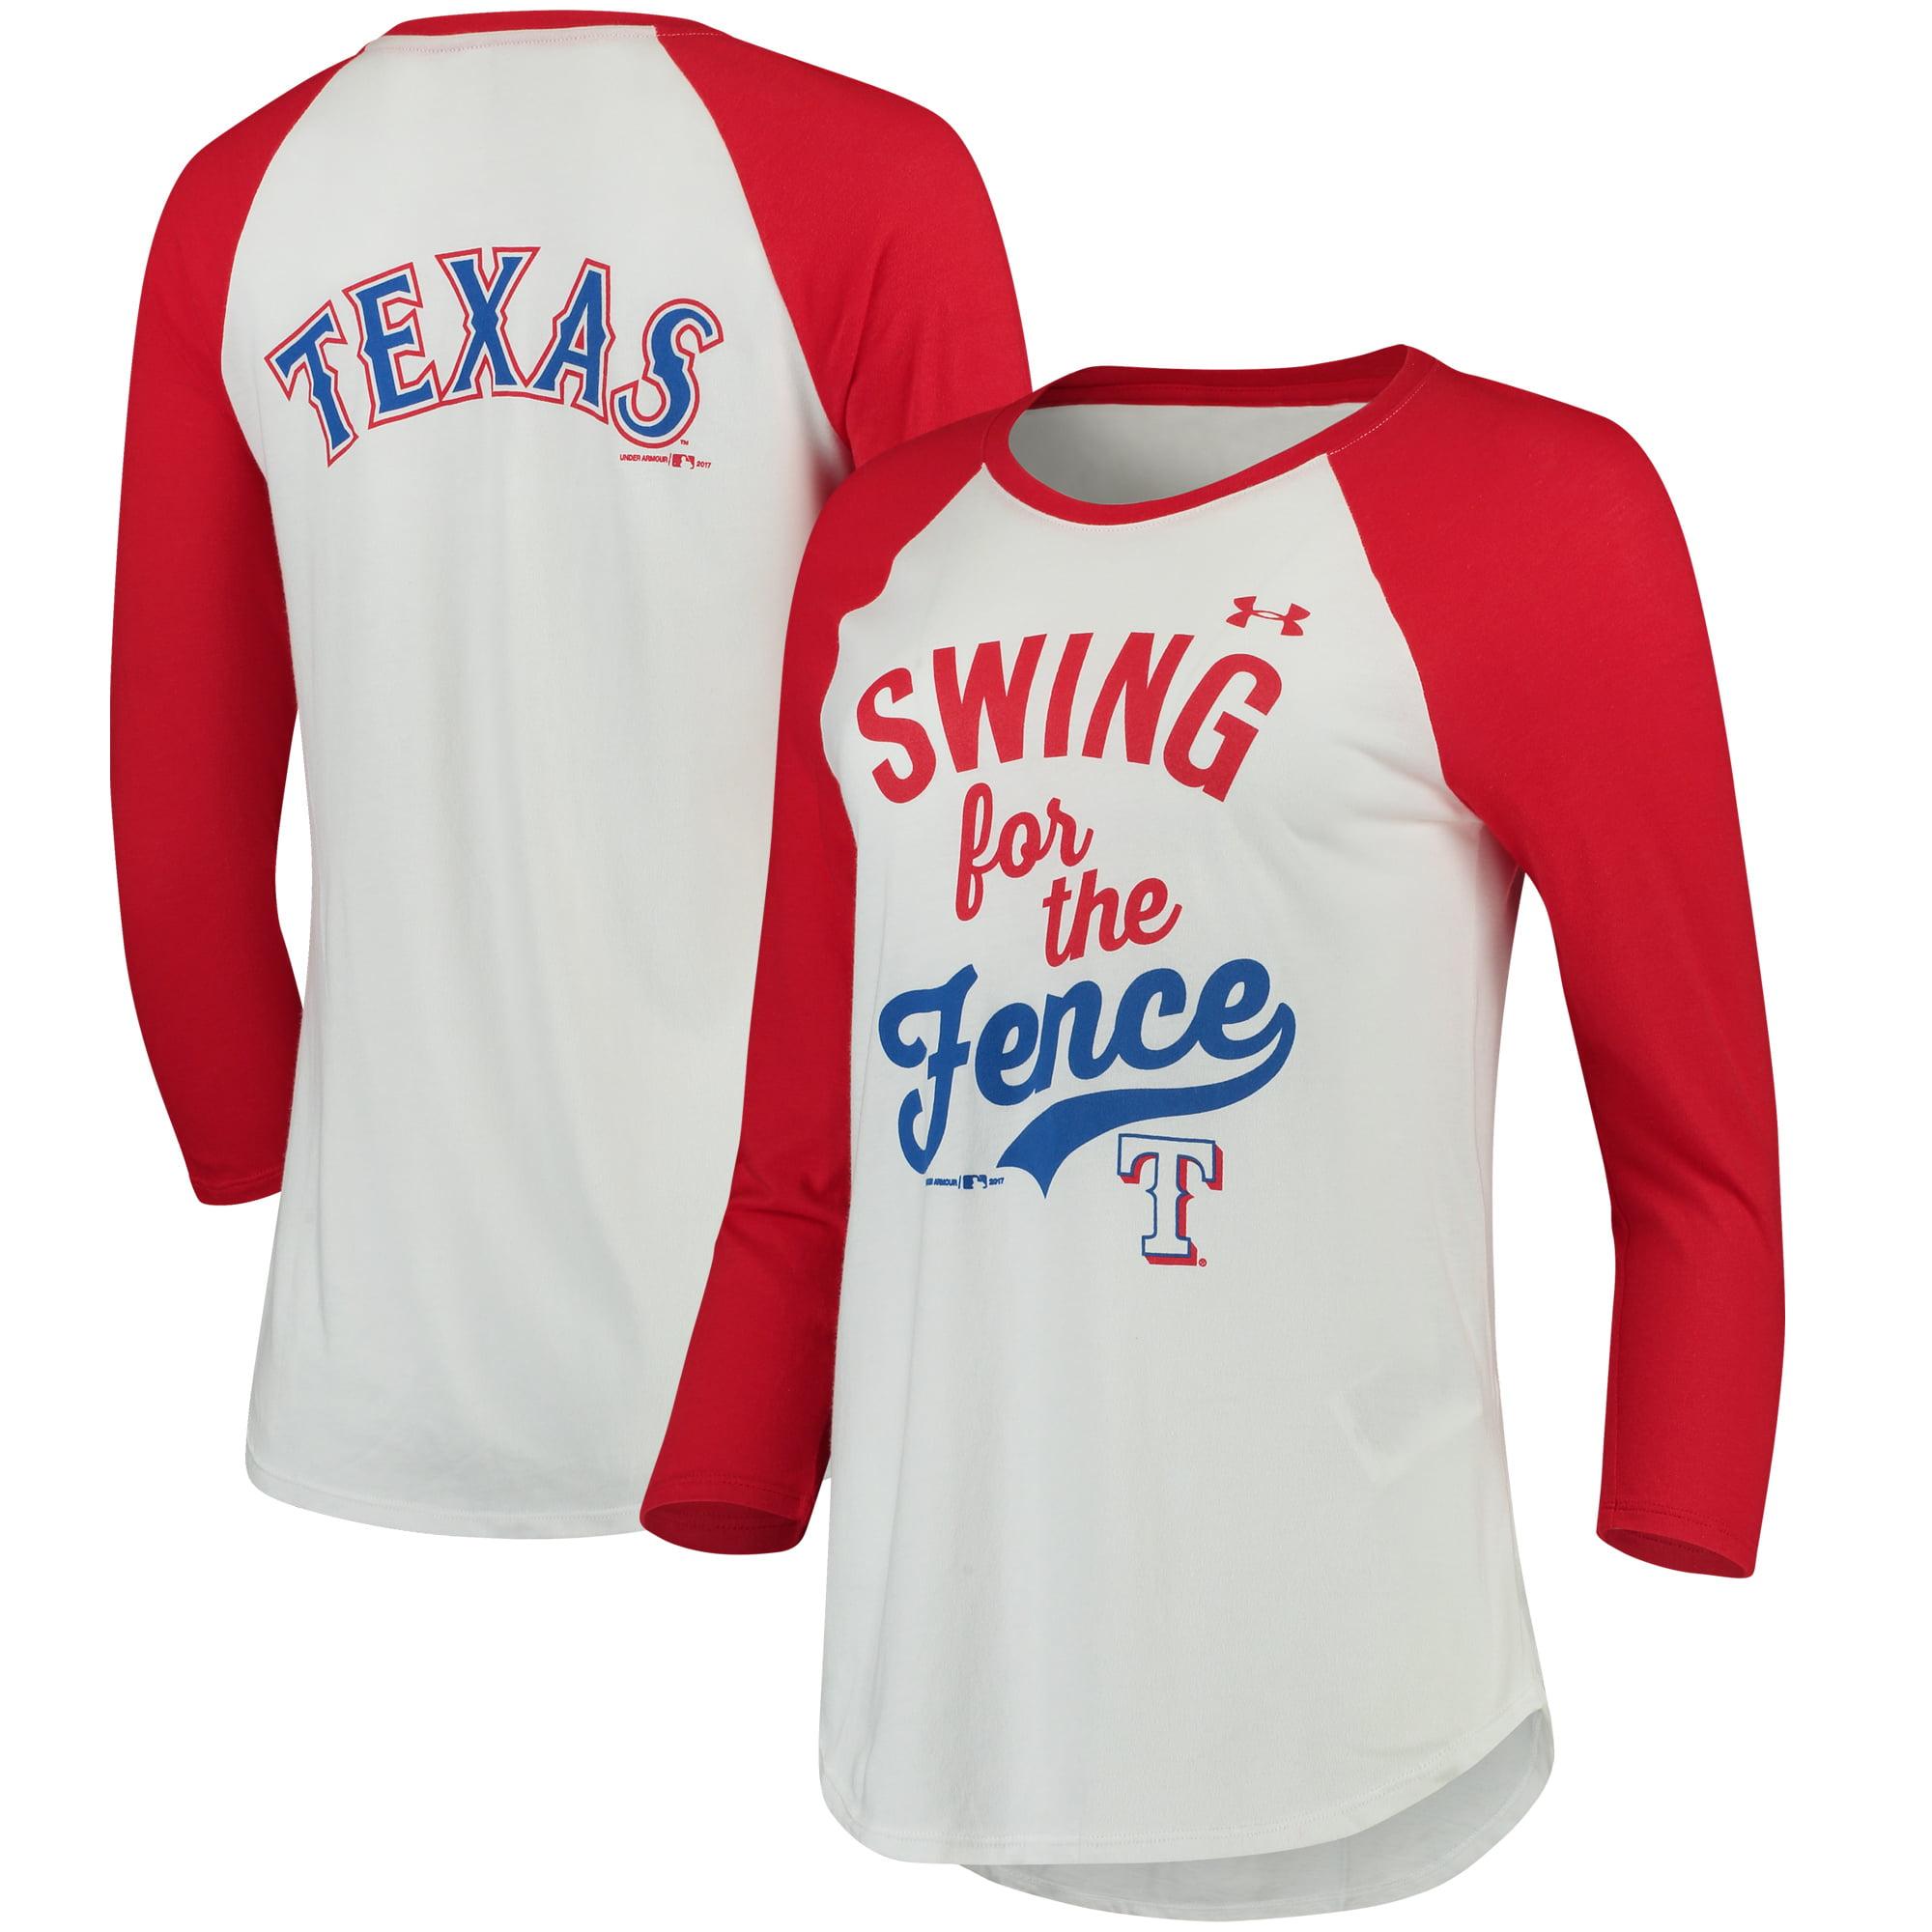 Texas Rangers Under Armour Women's Baseball 3/4-Sleeve Performance T-Shirt - White/Red